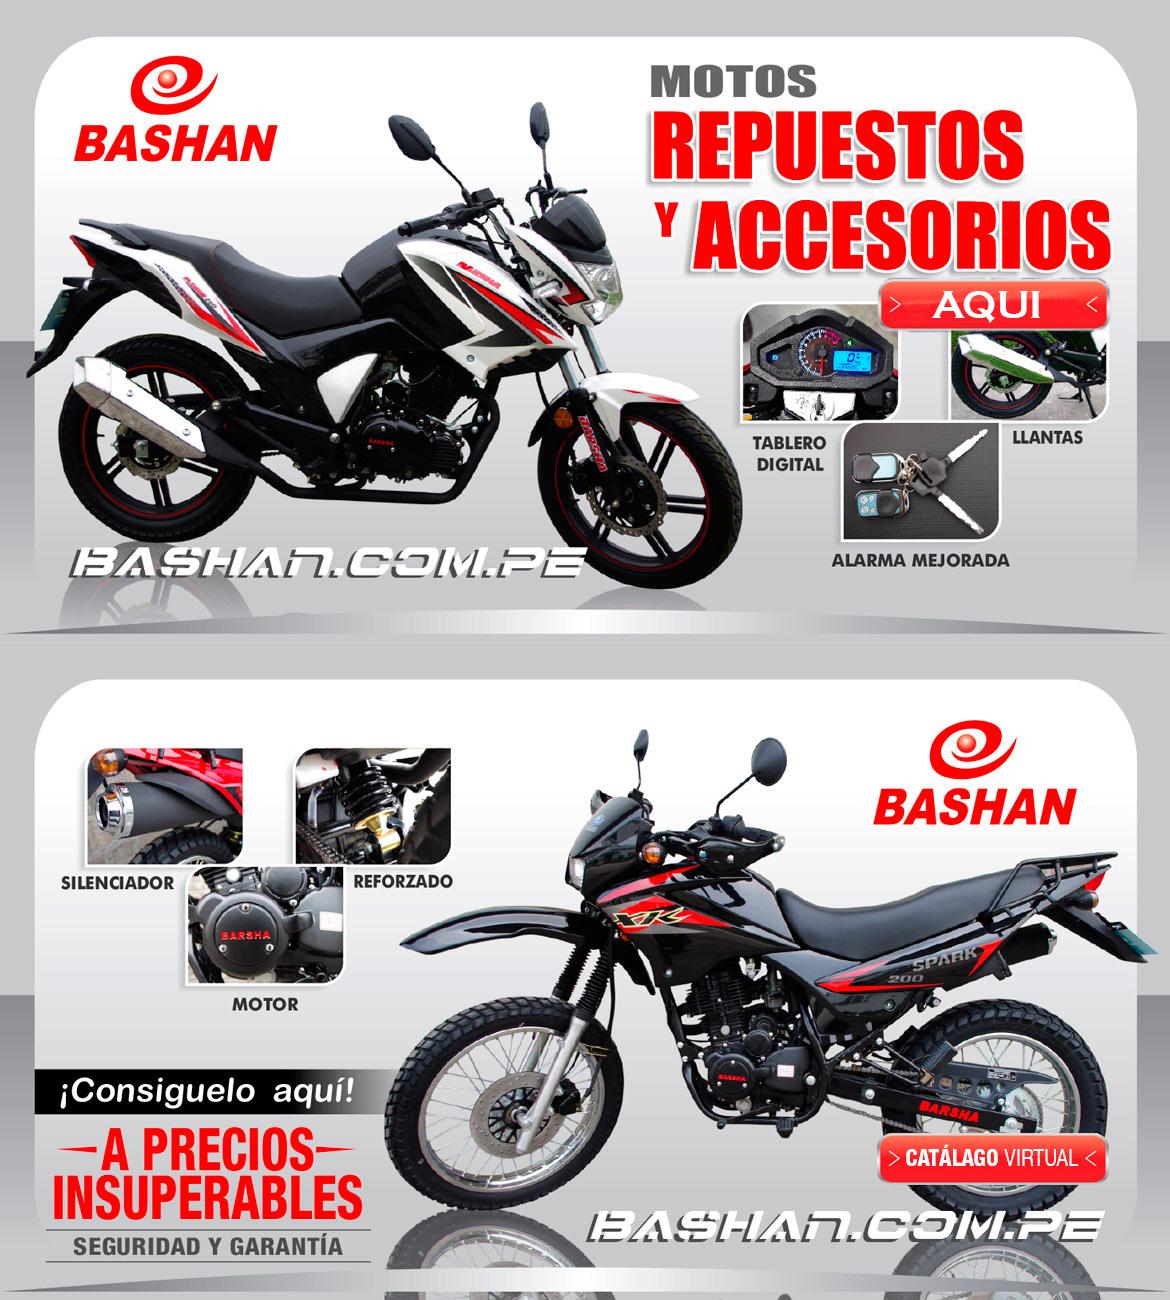 c7c6233600e BASHAN DEL PERU | Motos Bashan | Motos Modernas, Motos Exclusivas a ...